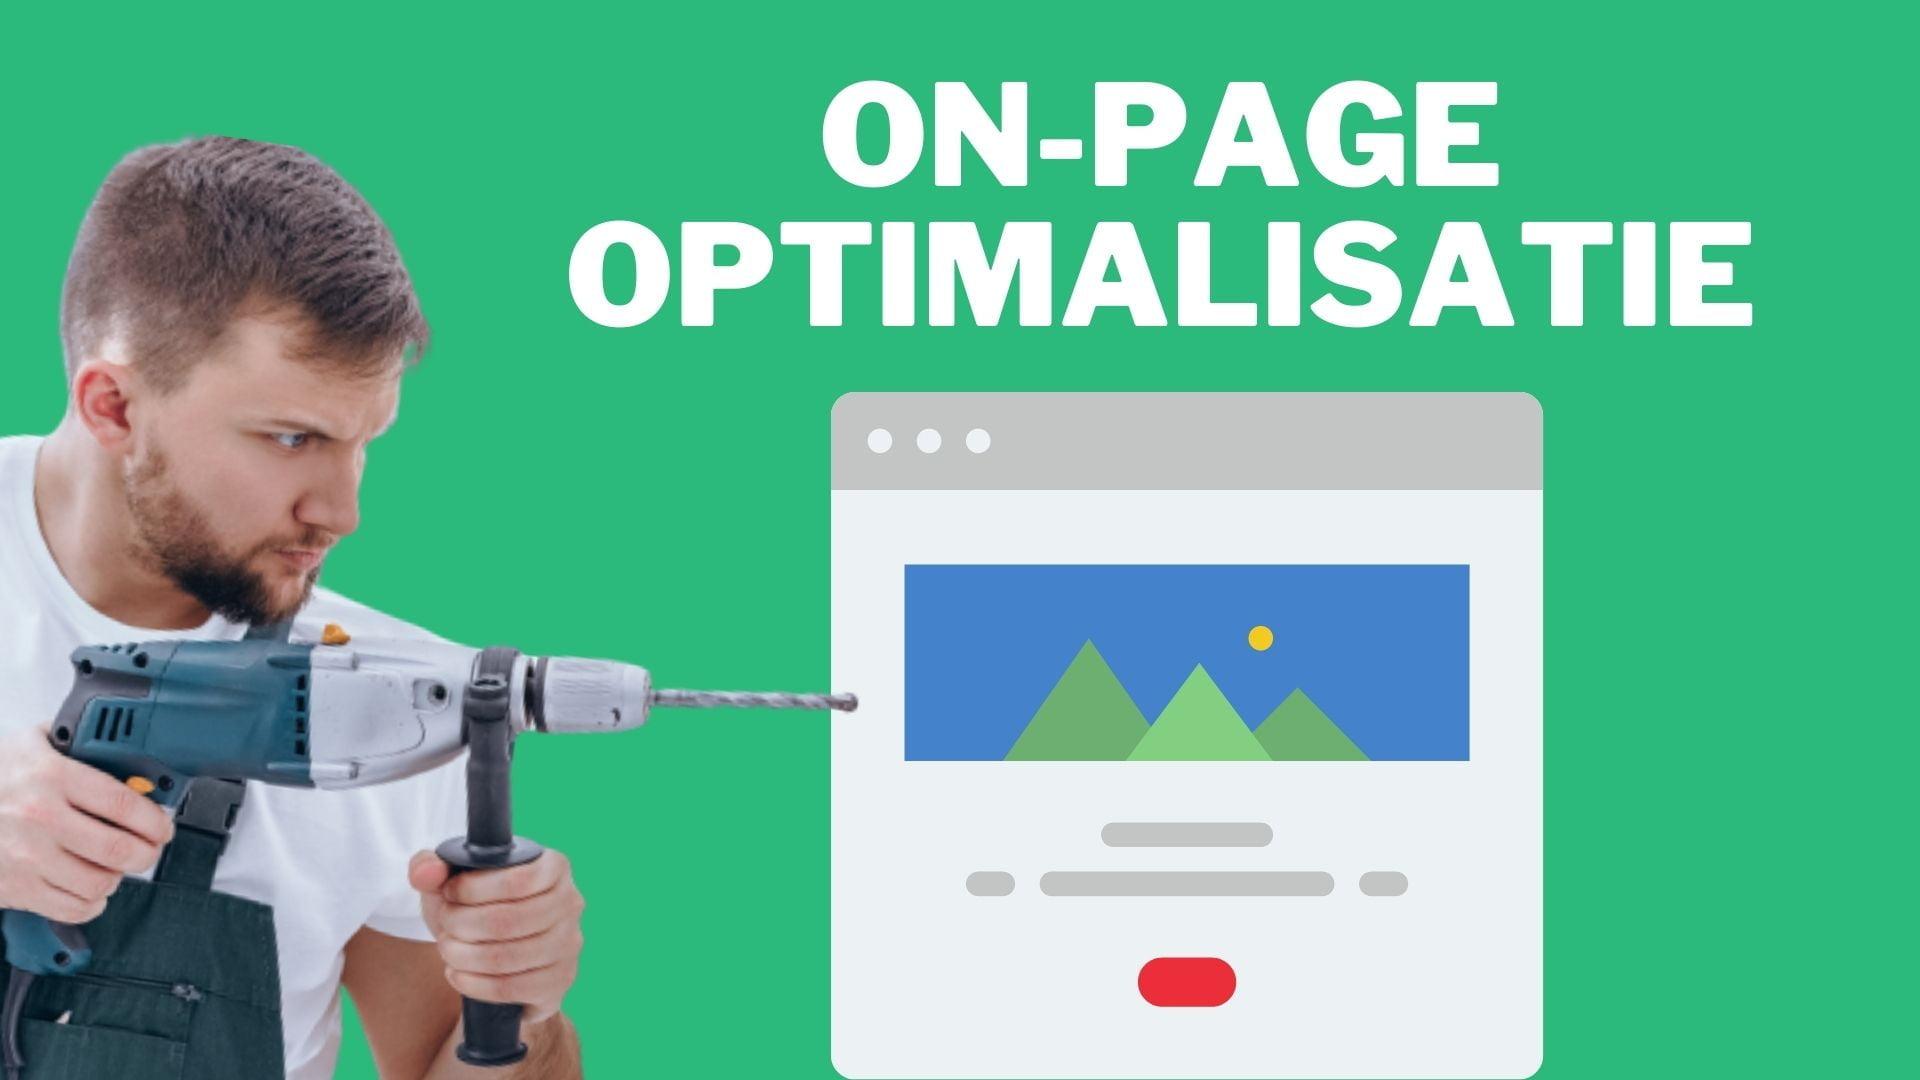 on-page optimalisatie